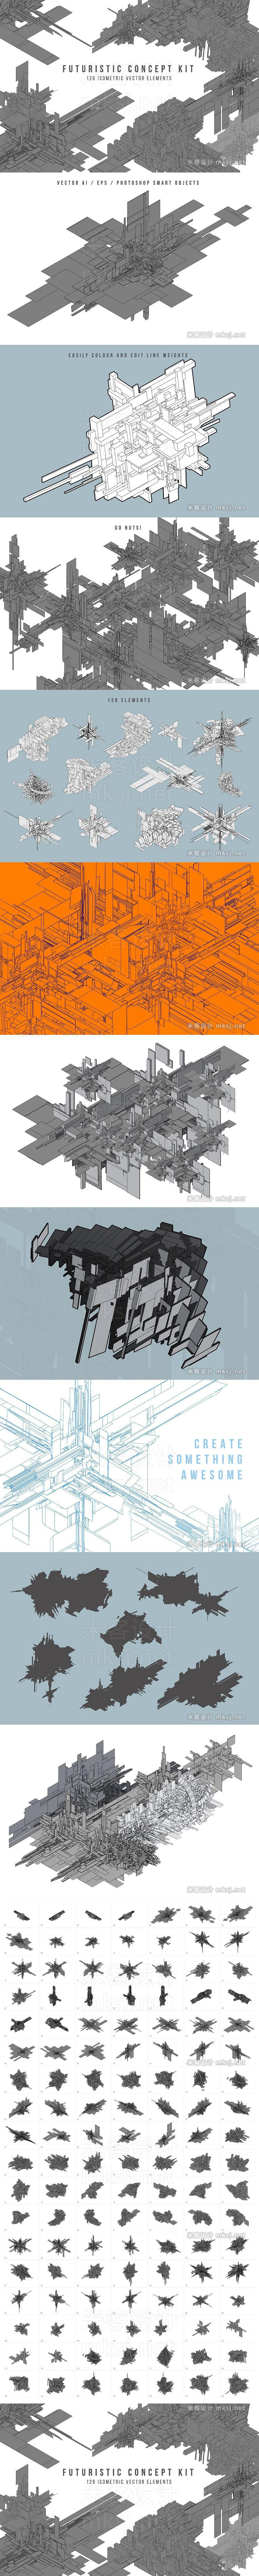 png素材 Futuristic Concept Kit